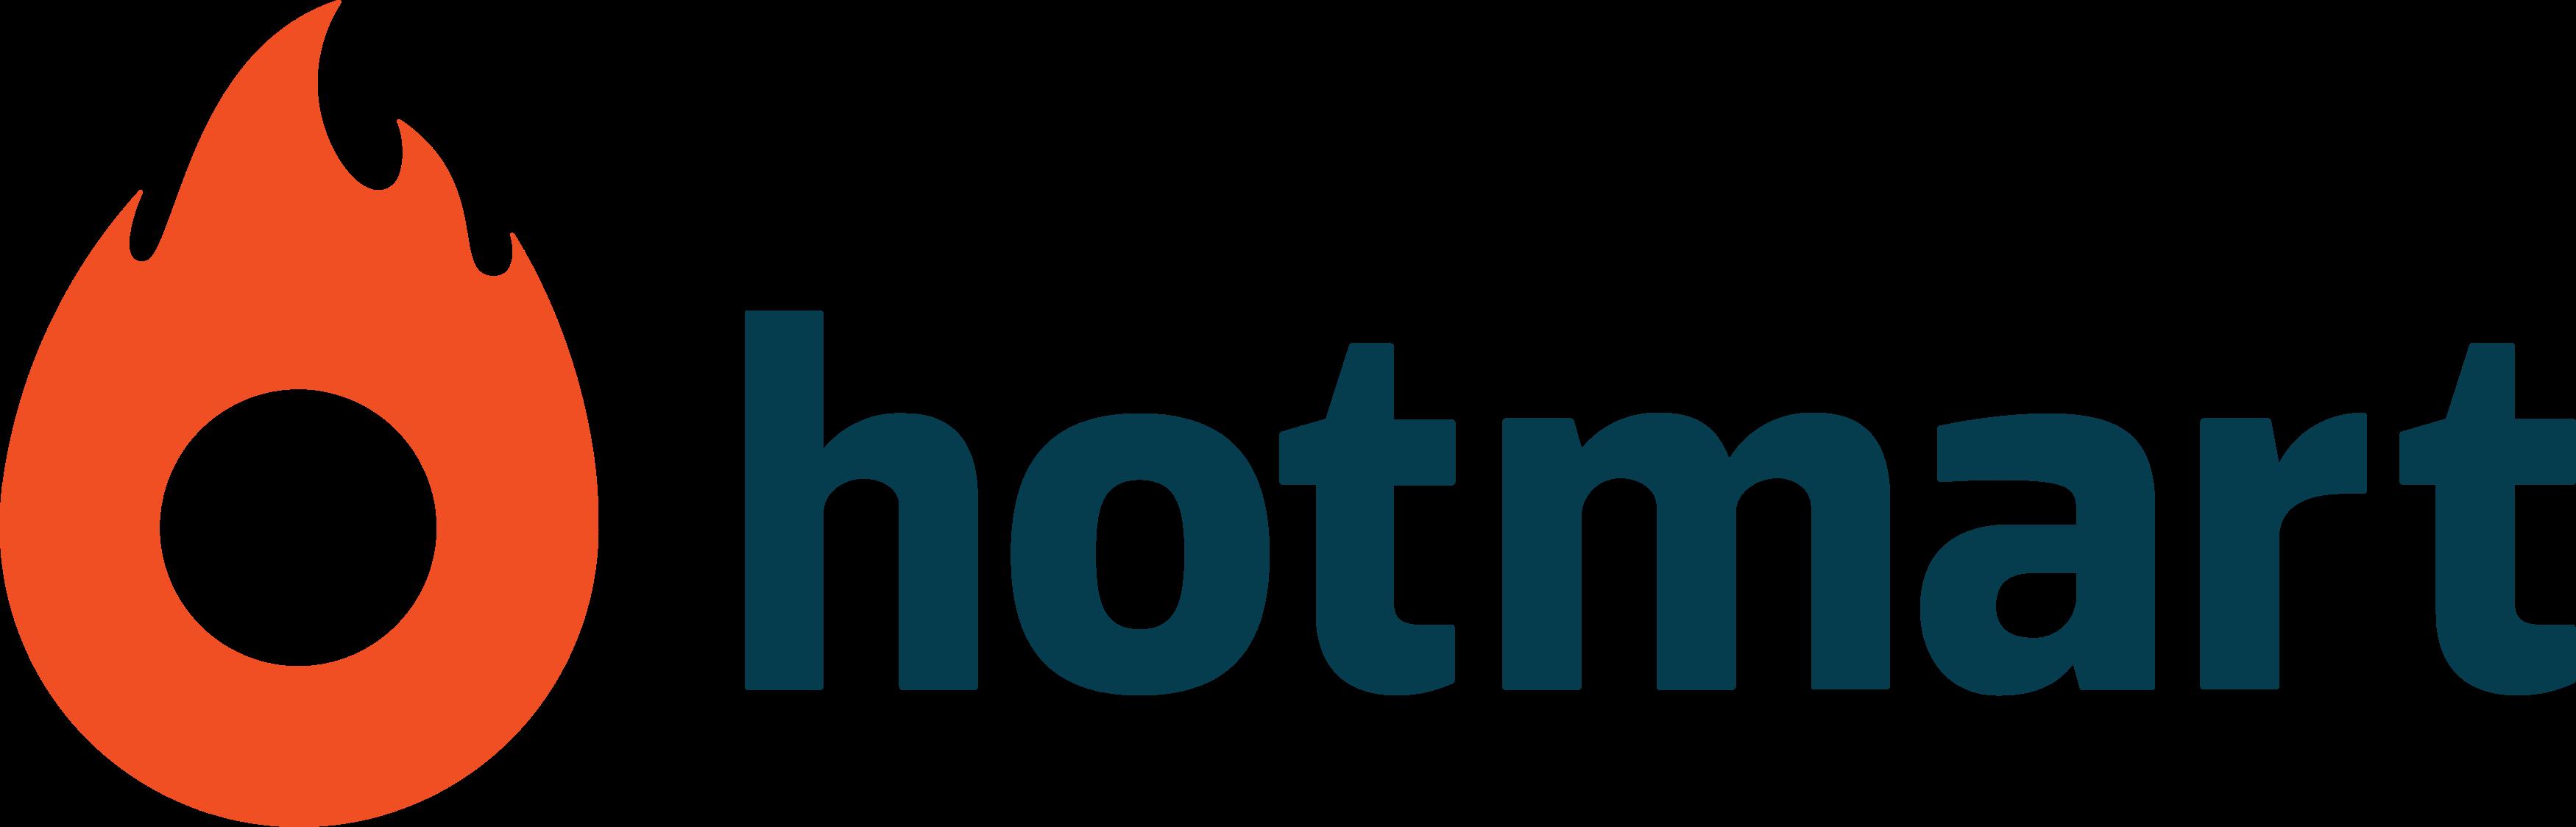 Hotmart Logo.